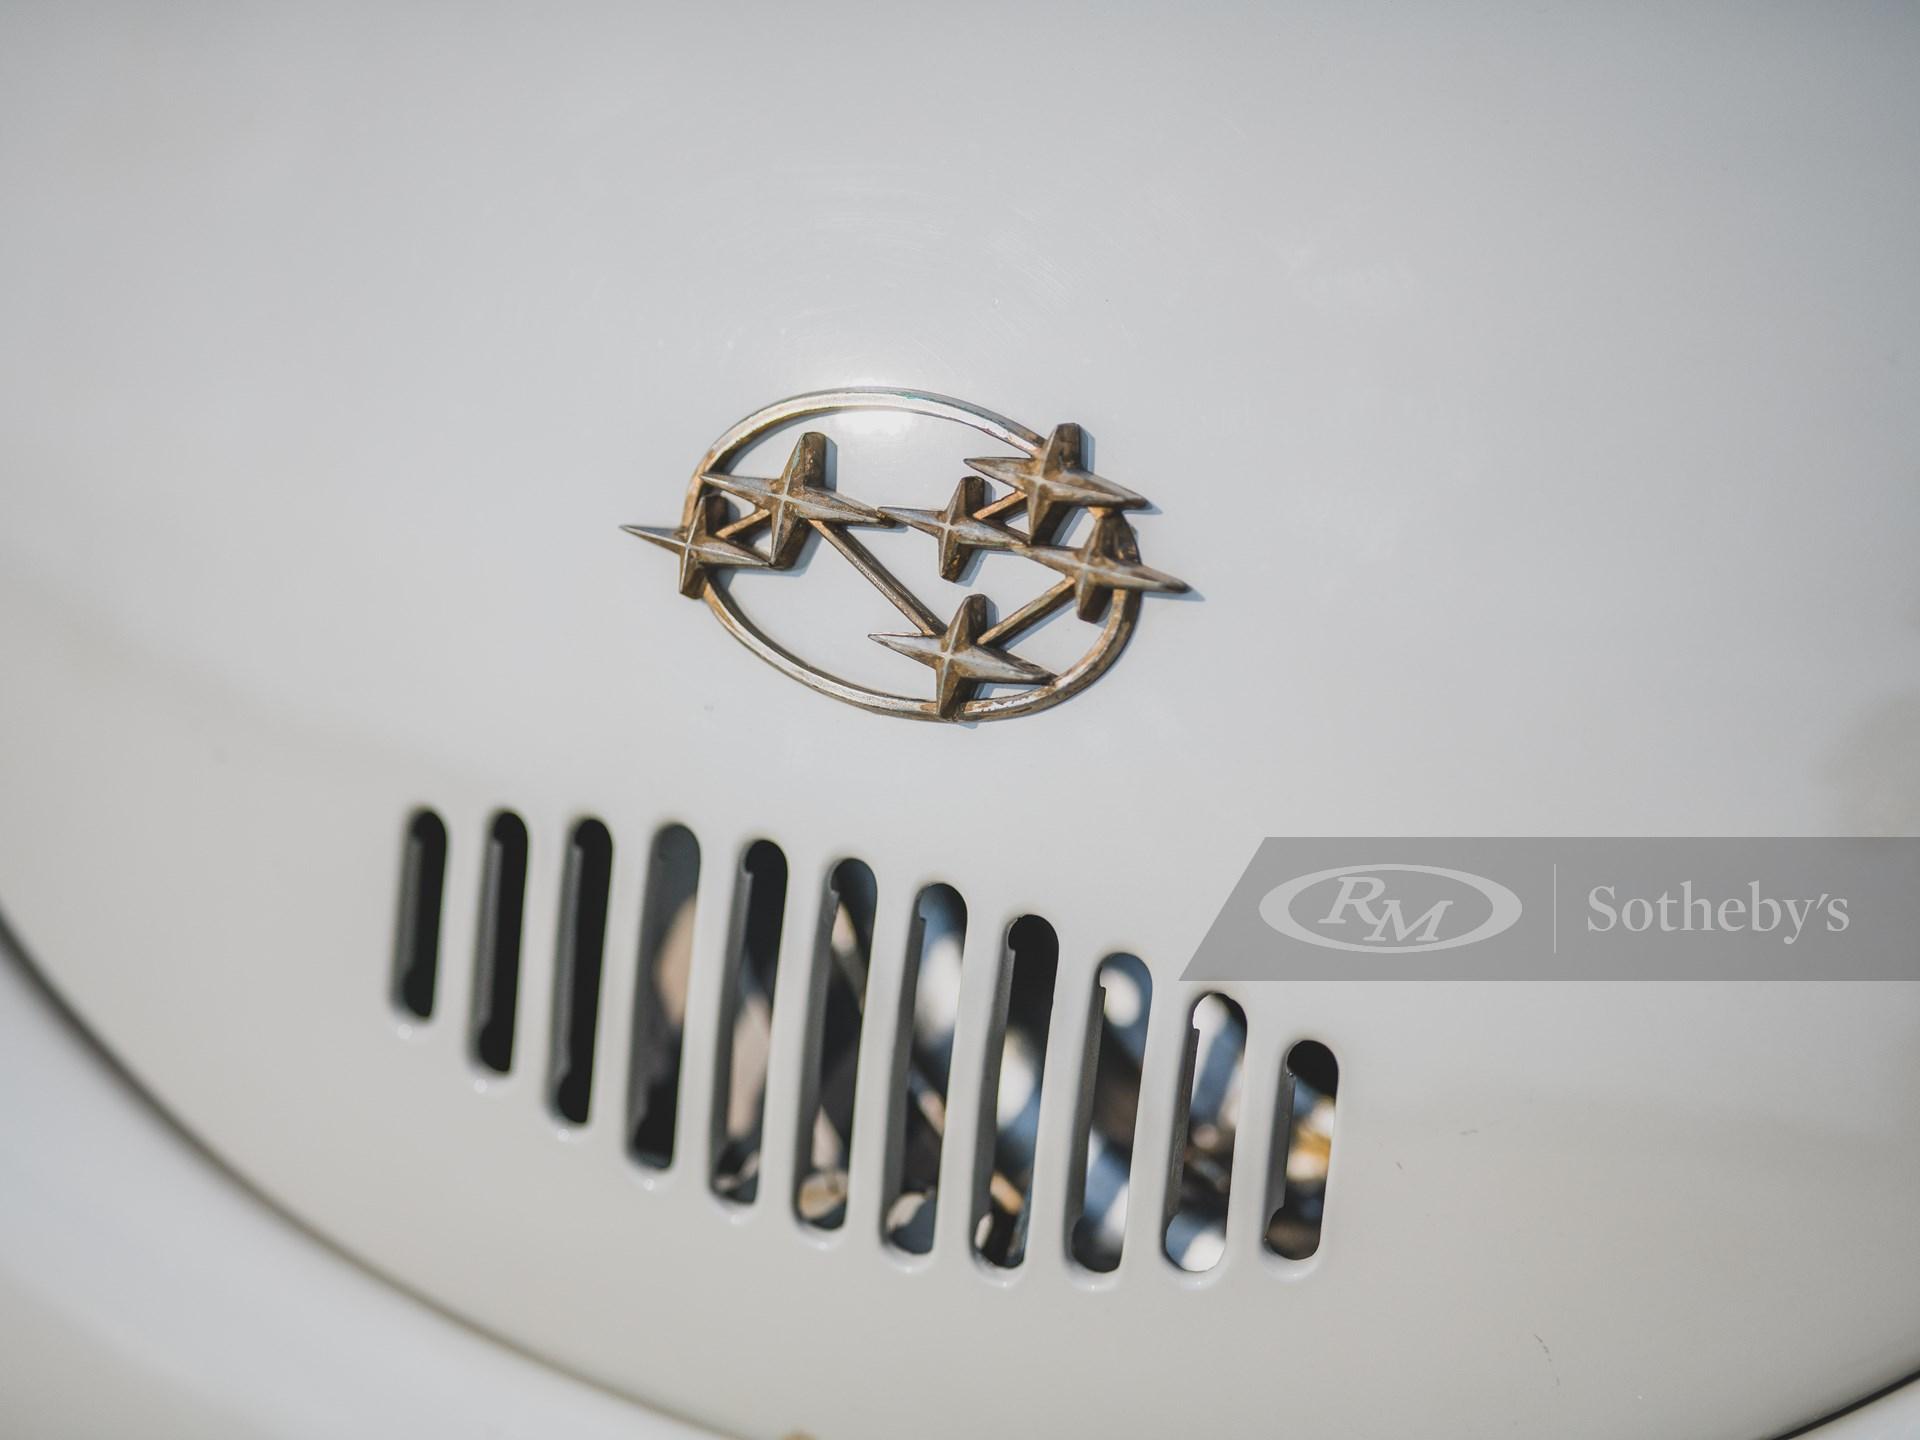 1969 Subaru 360 Deluxe  -